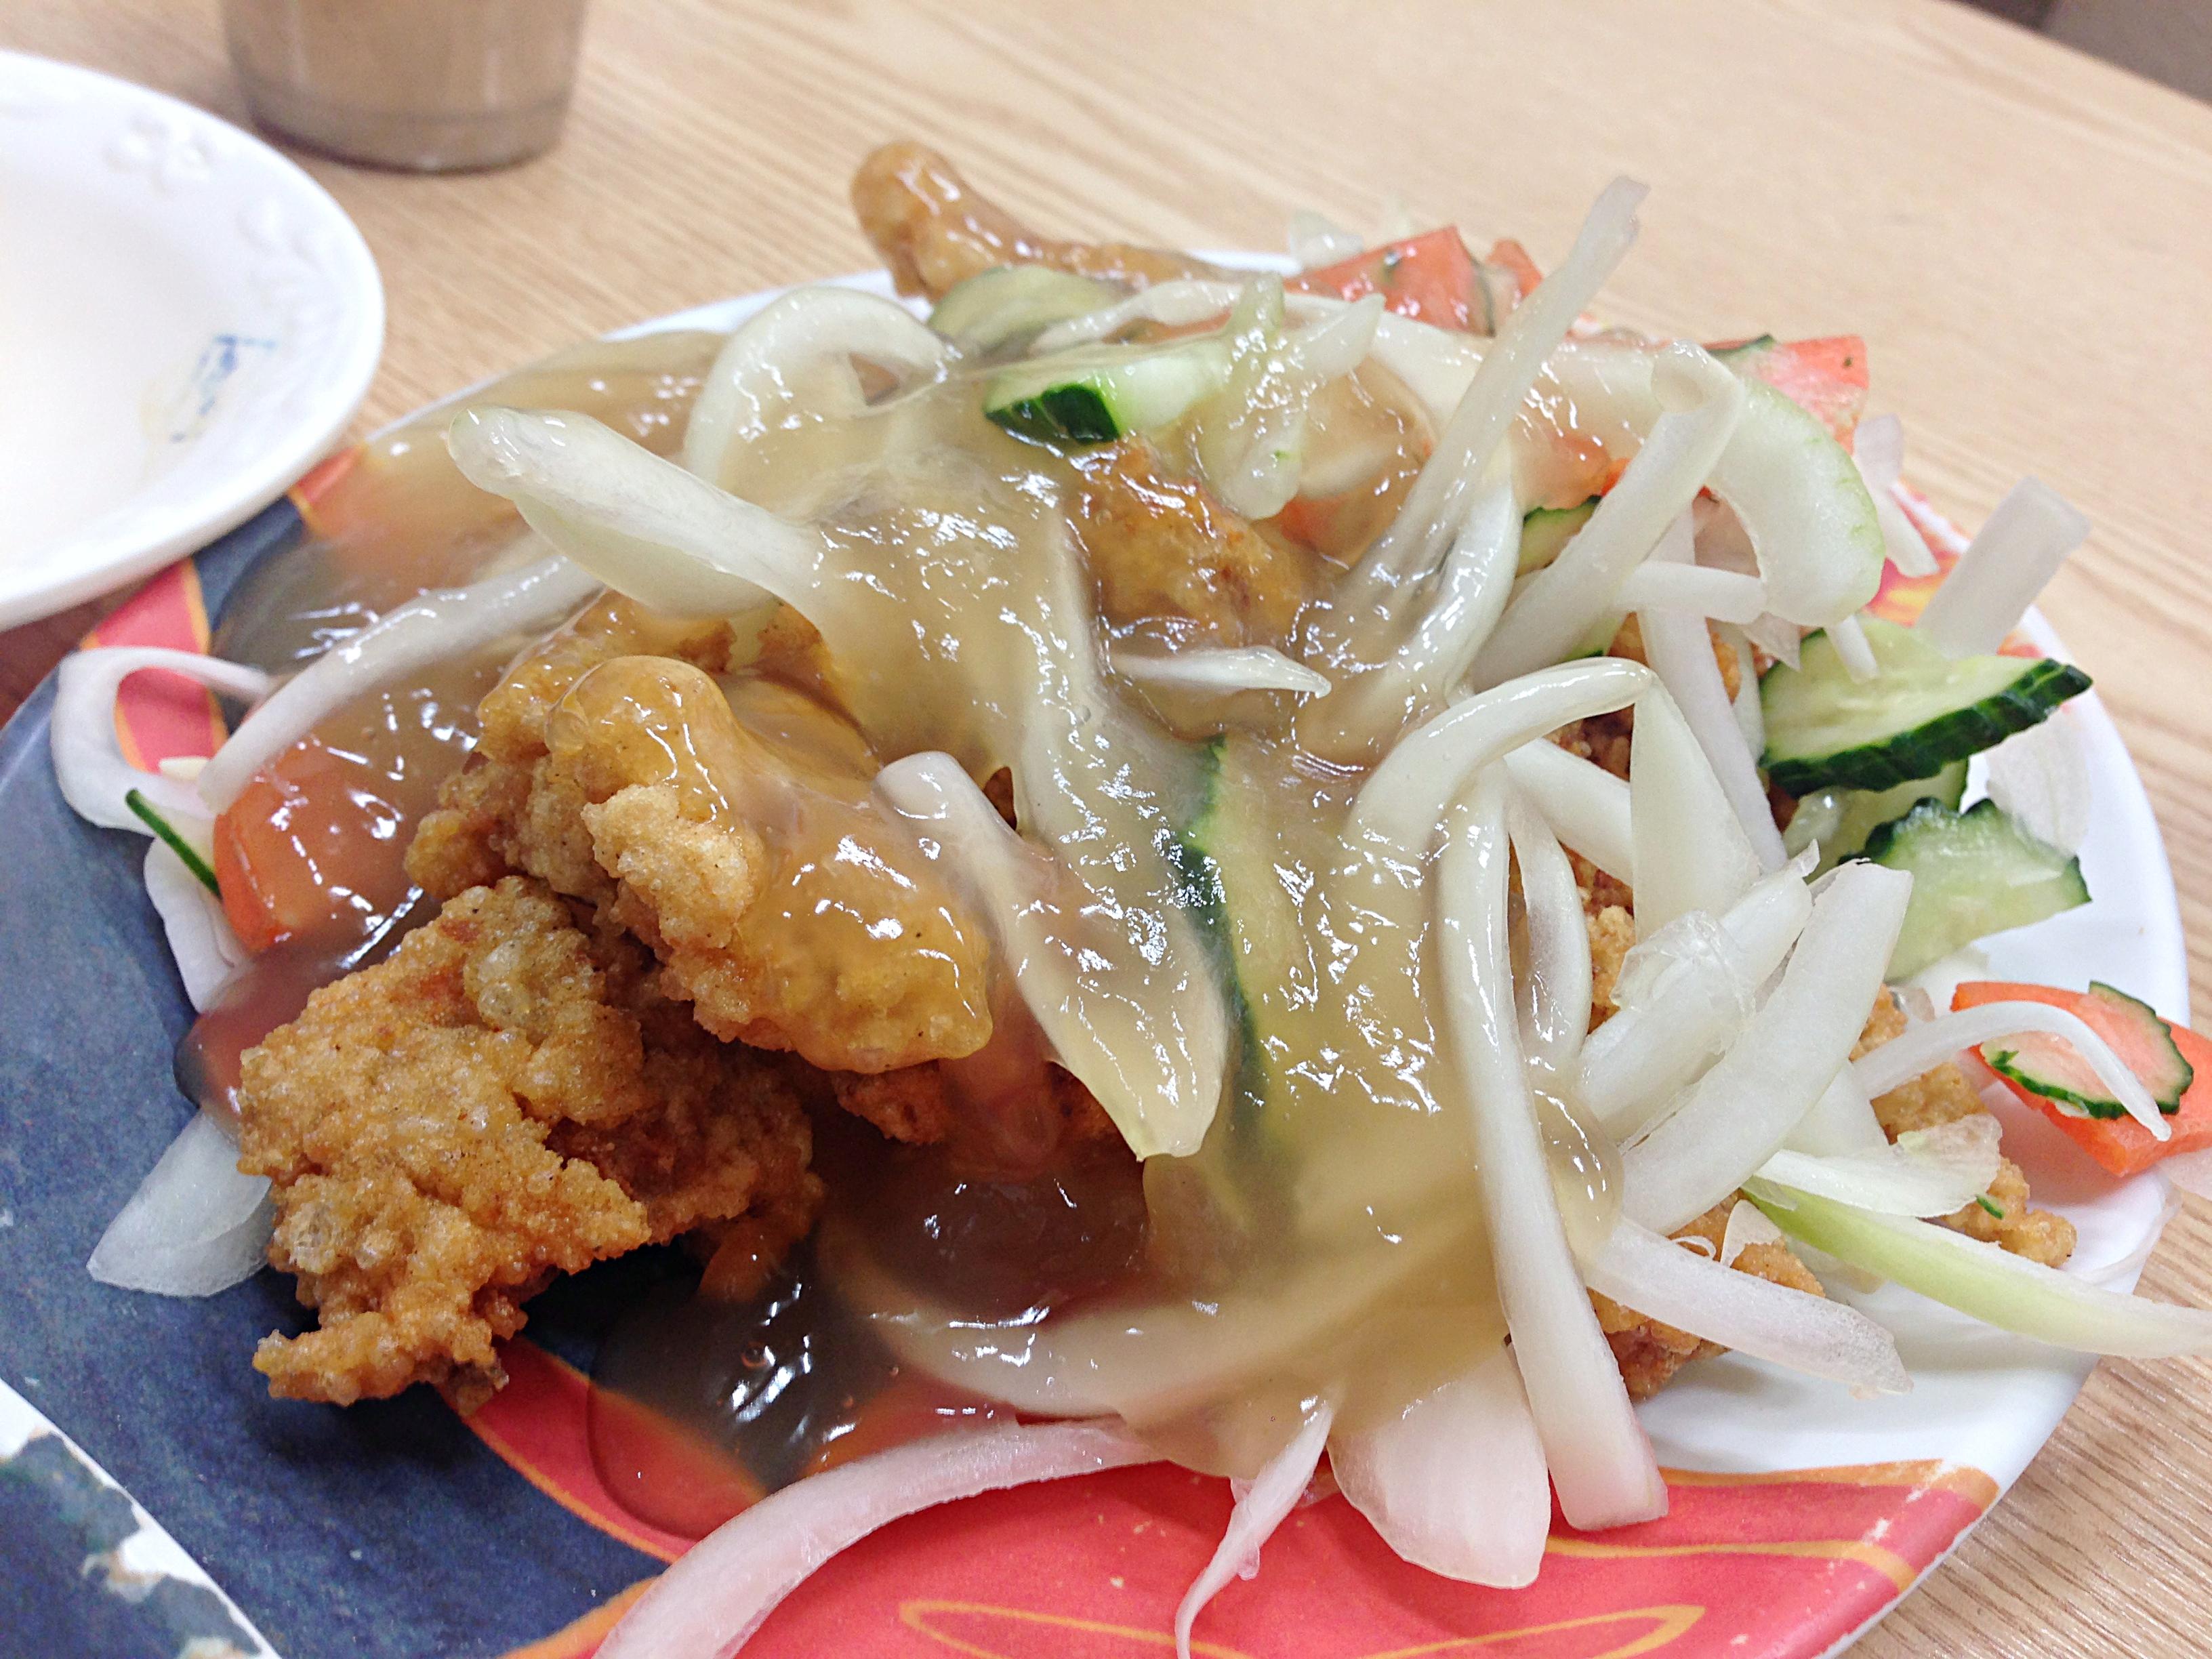 26 Sep 2014: Sweet & Sour Pork lunch!